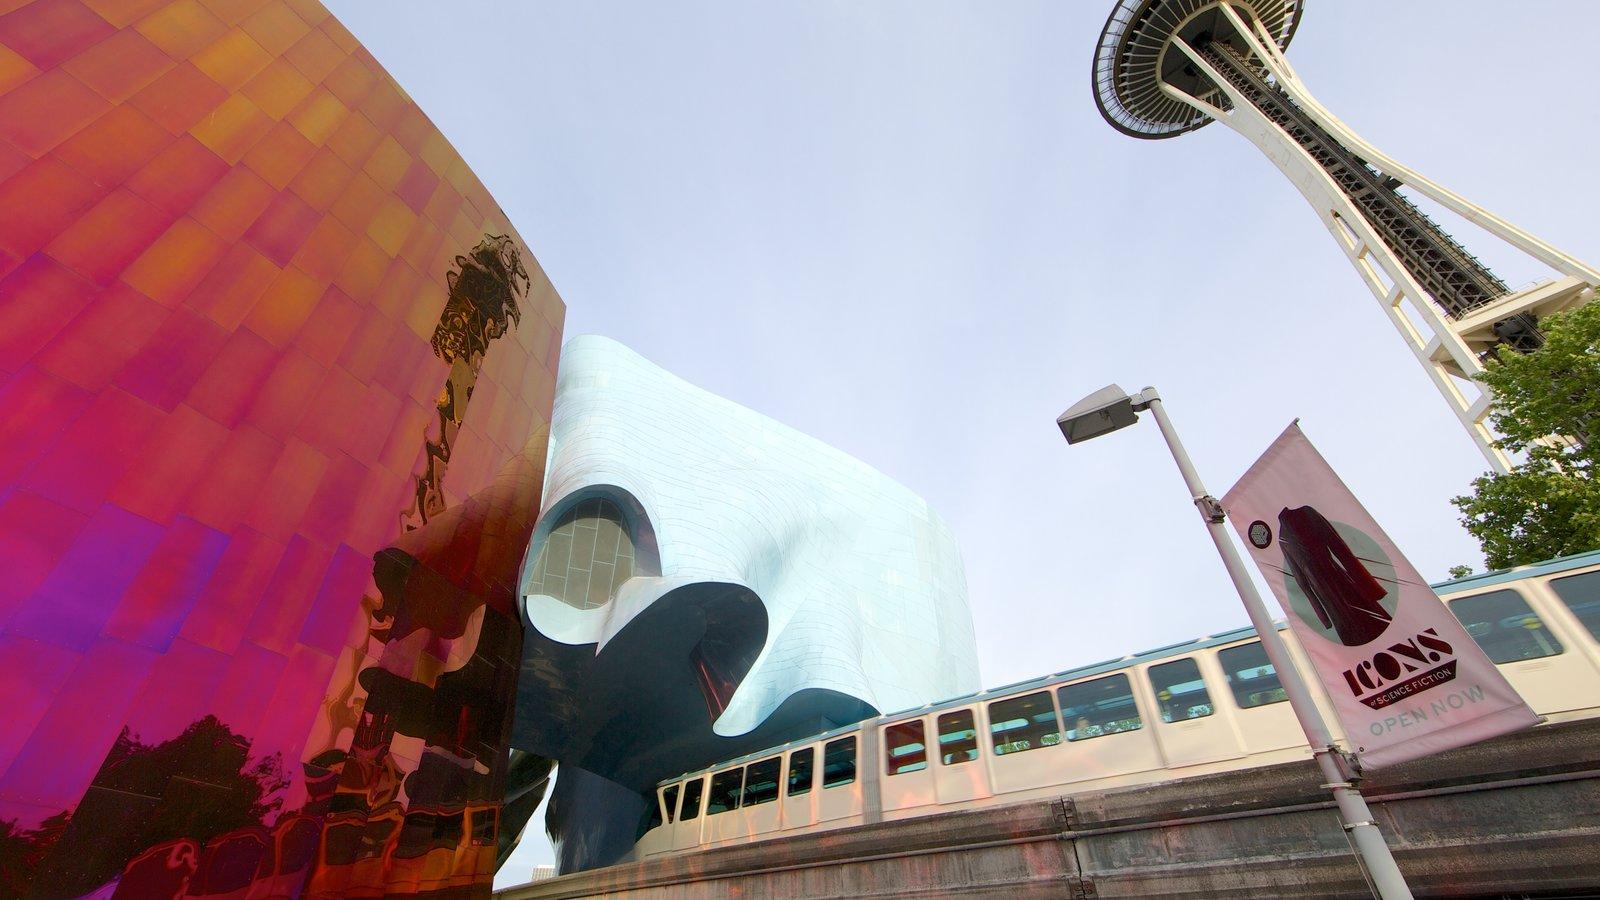 Seattle Center que inclui arquitetura moderna